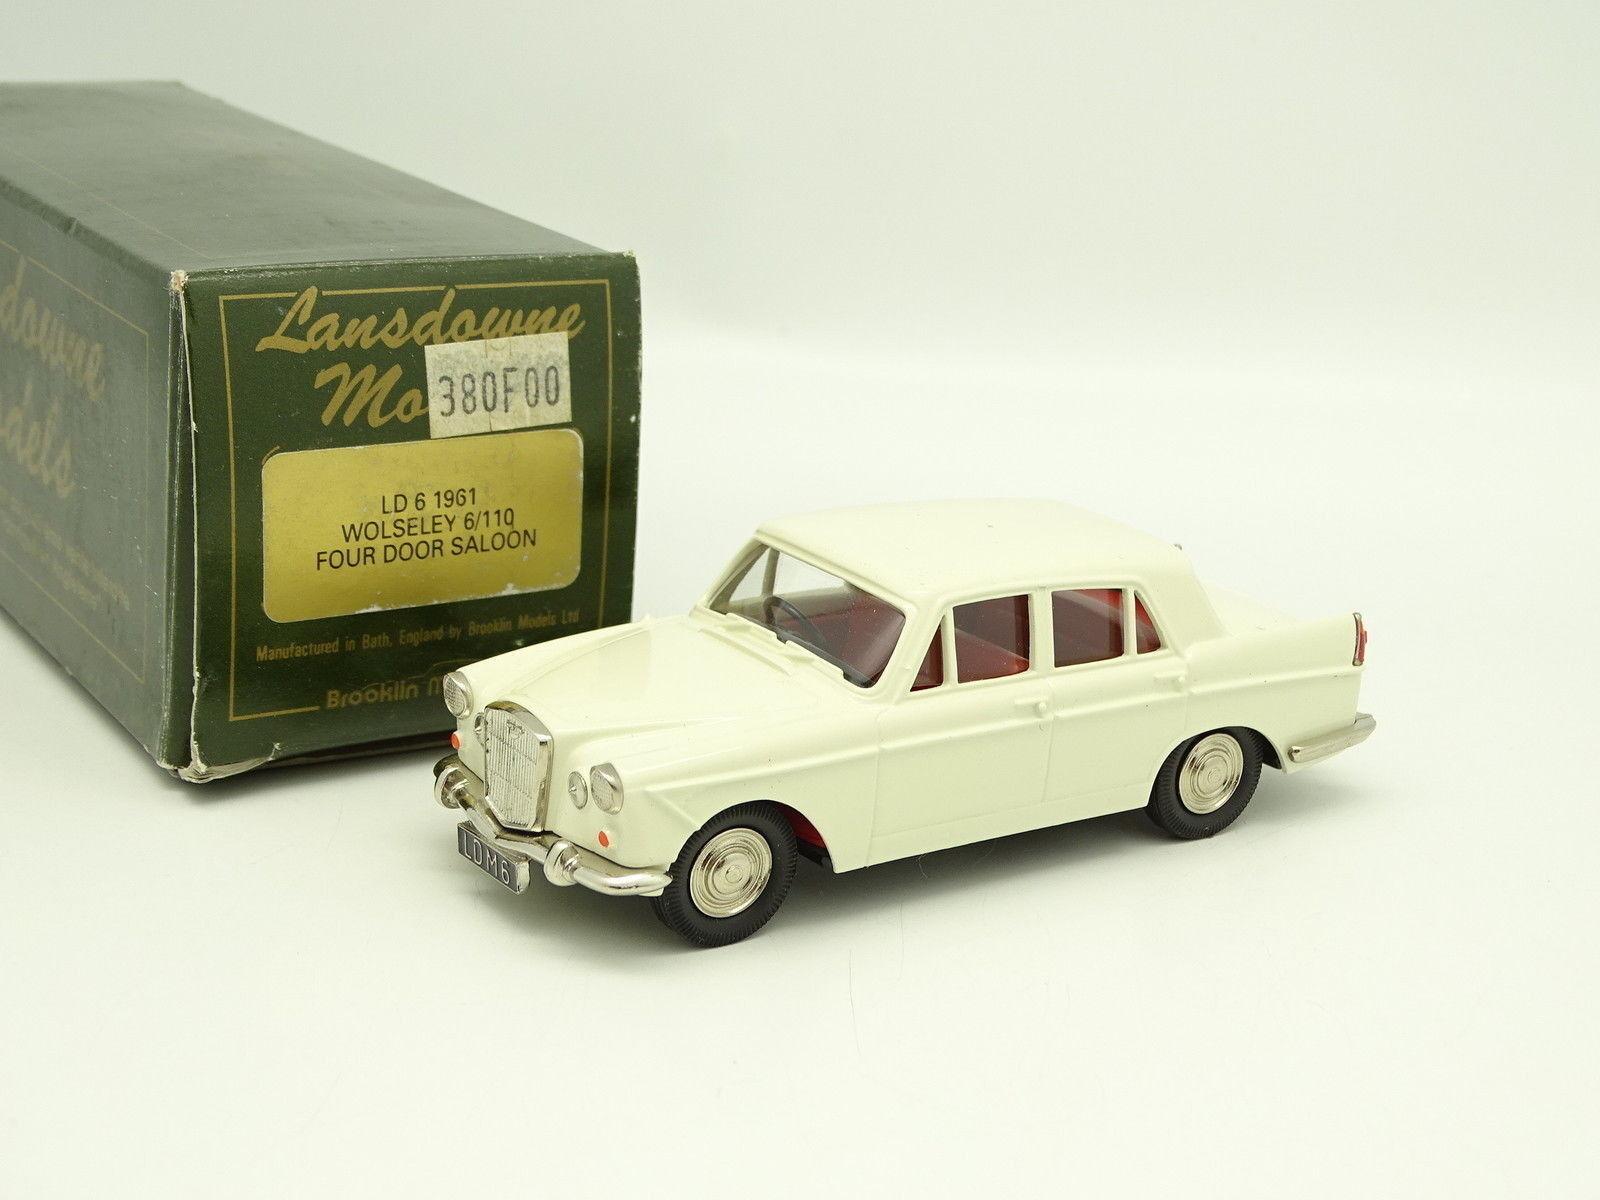 Lansdowne Models 1 43 - Wolseley 6 110 Saloon biancahe